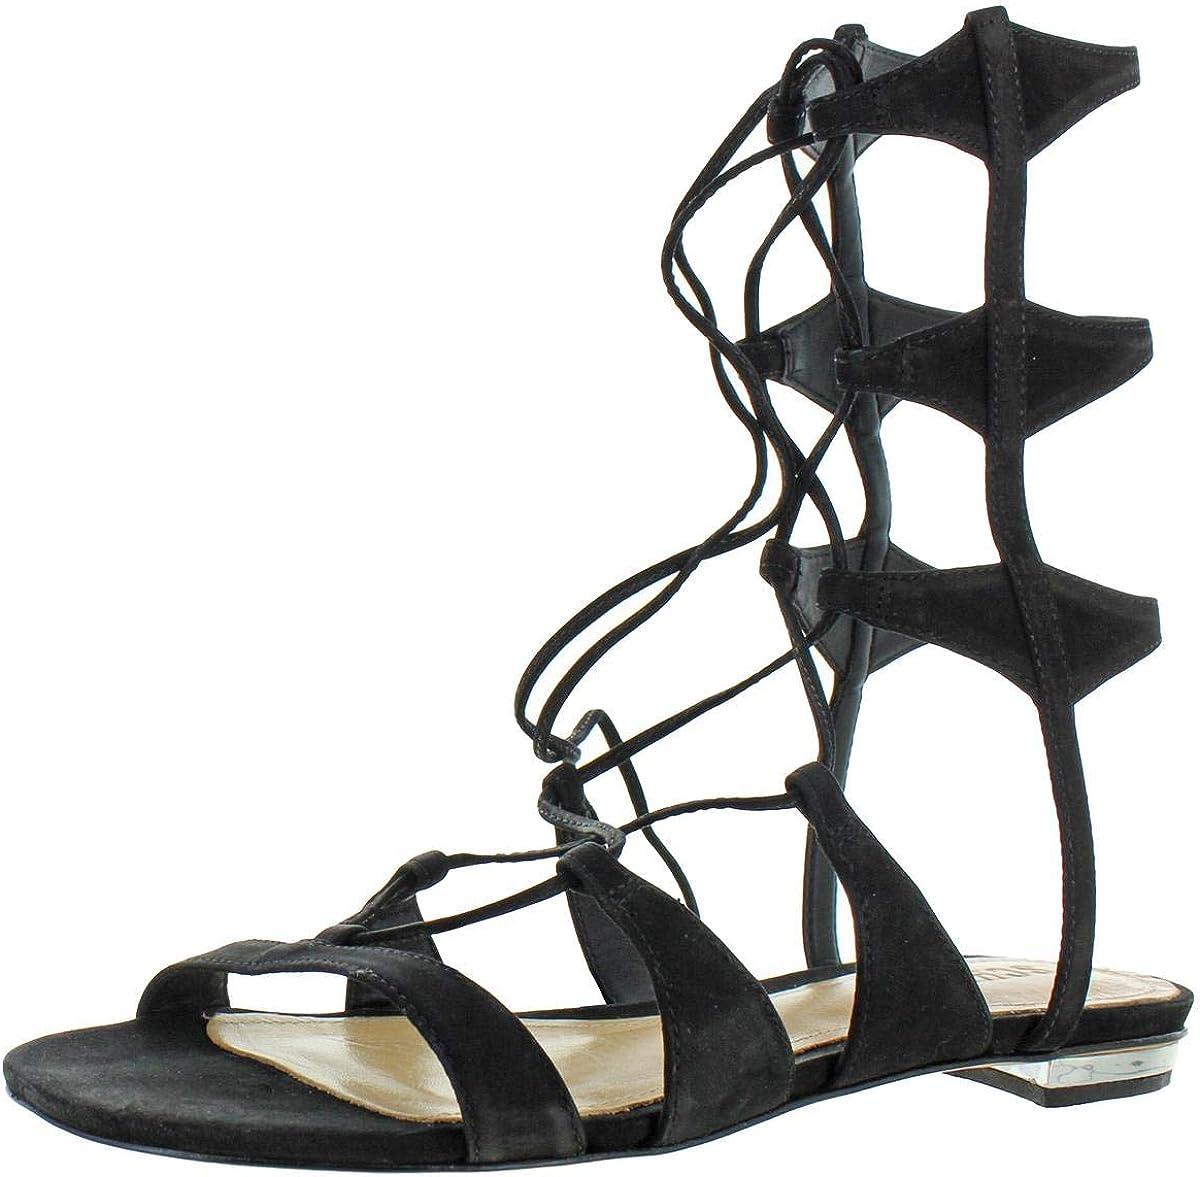 Suede Flat Gladiator Sandals Black